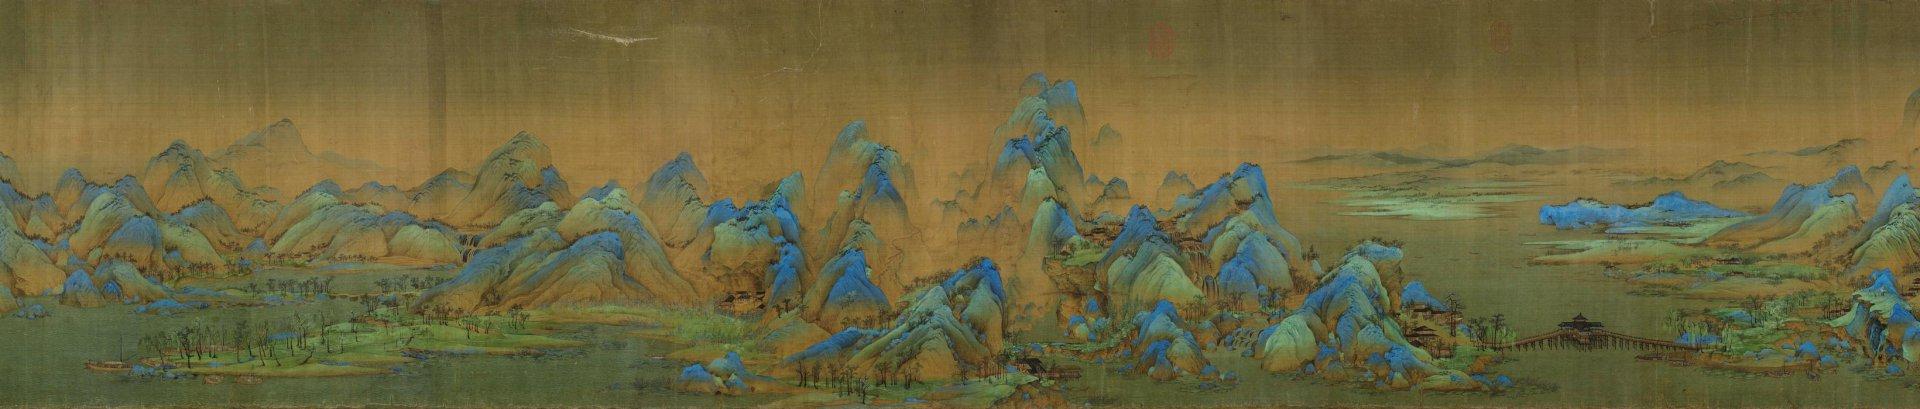 4.tWang_Ximeng_-_A_Thousand_Li_of_River_(Bridge).jpg